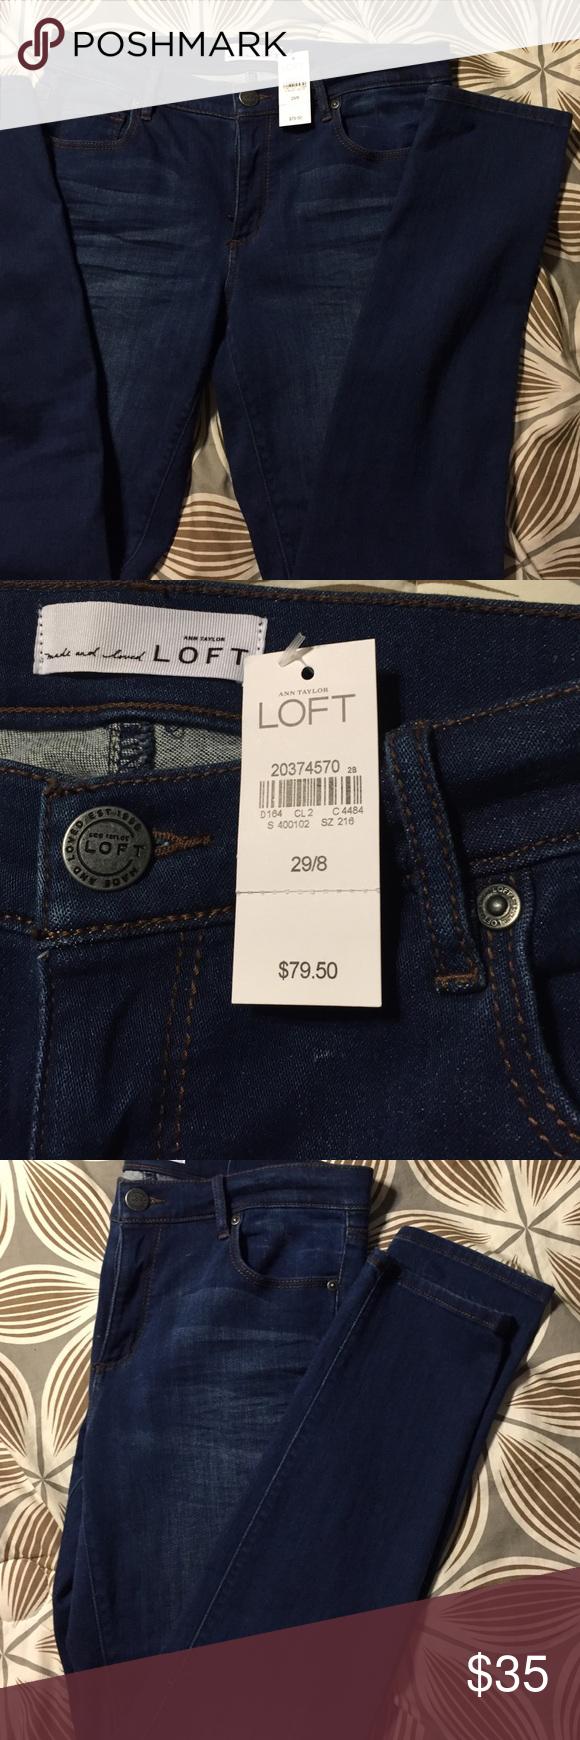 Ann Taylor Loft Jeans NWT NWT Ann Taylor Loft soft denim skinny jeans. Size 29/8 LOFT Jeans Skinny